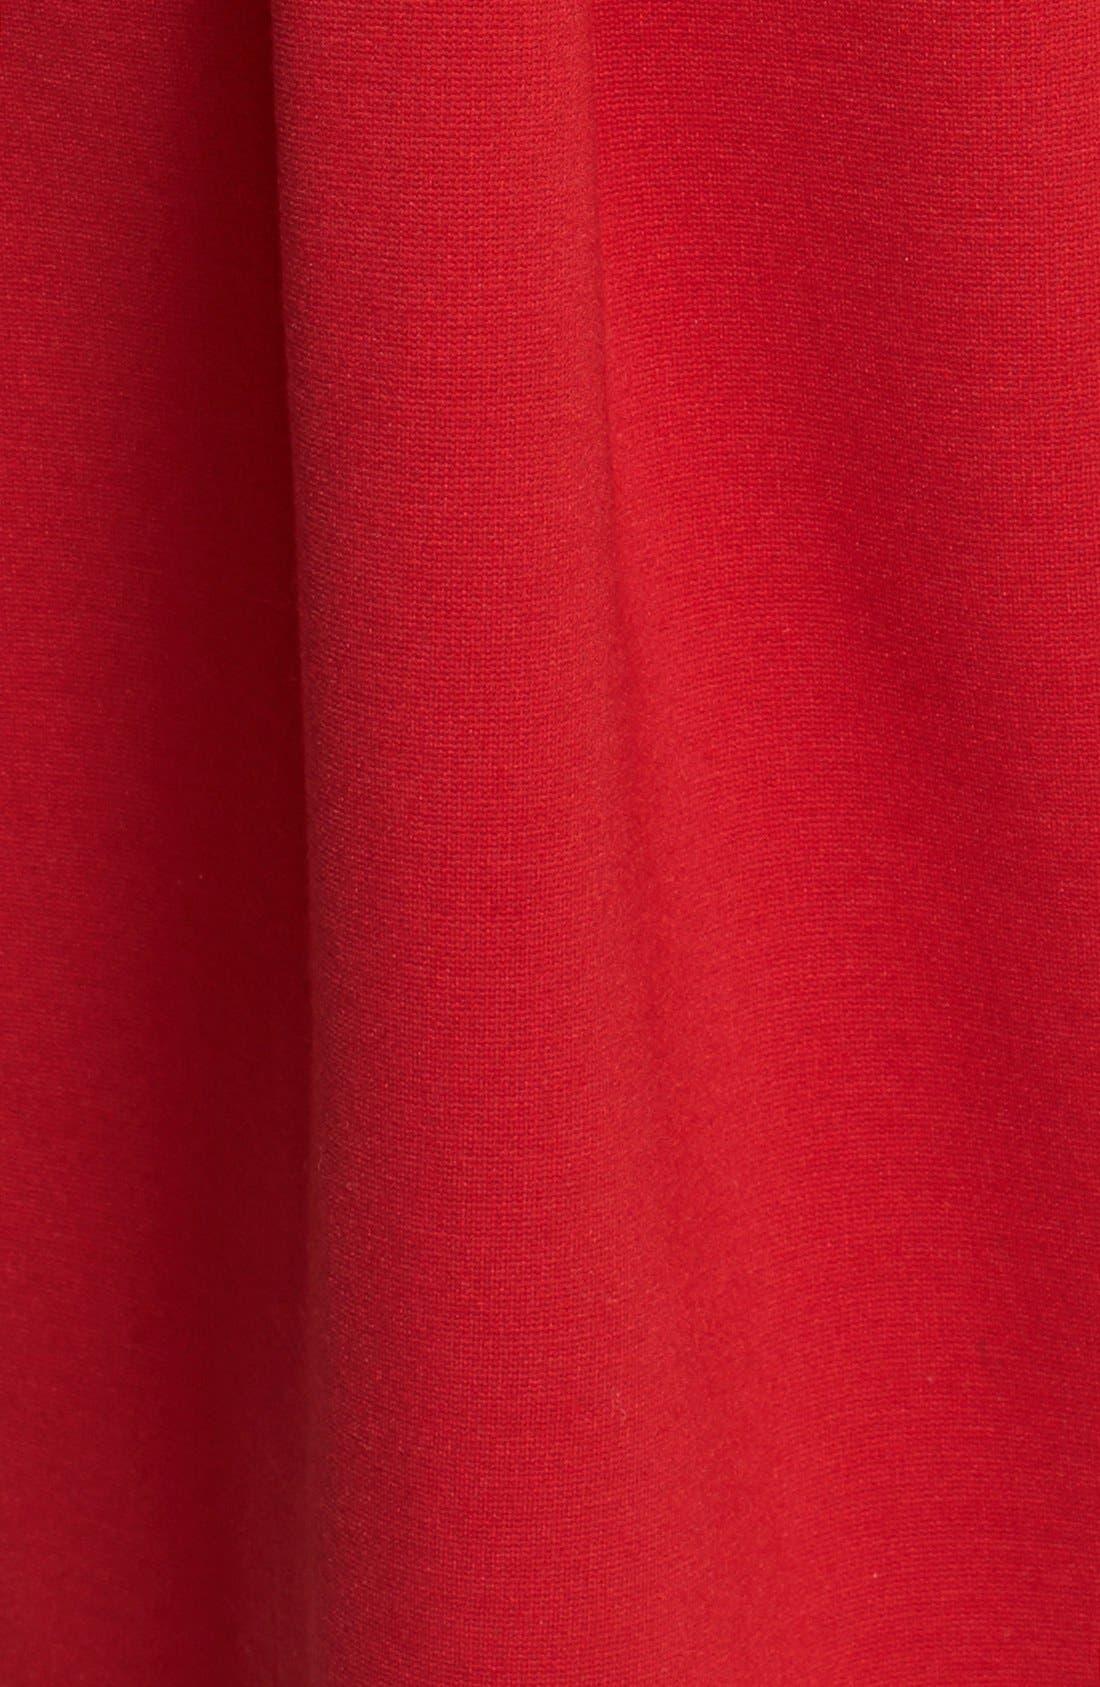 Alternate Image 3  - Betsey Johnson Bow Detail Ponte Fit & Flare Dress